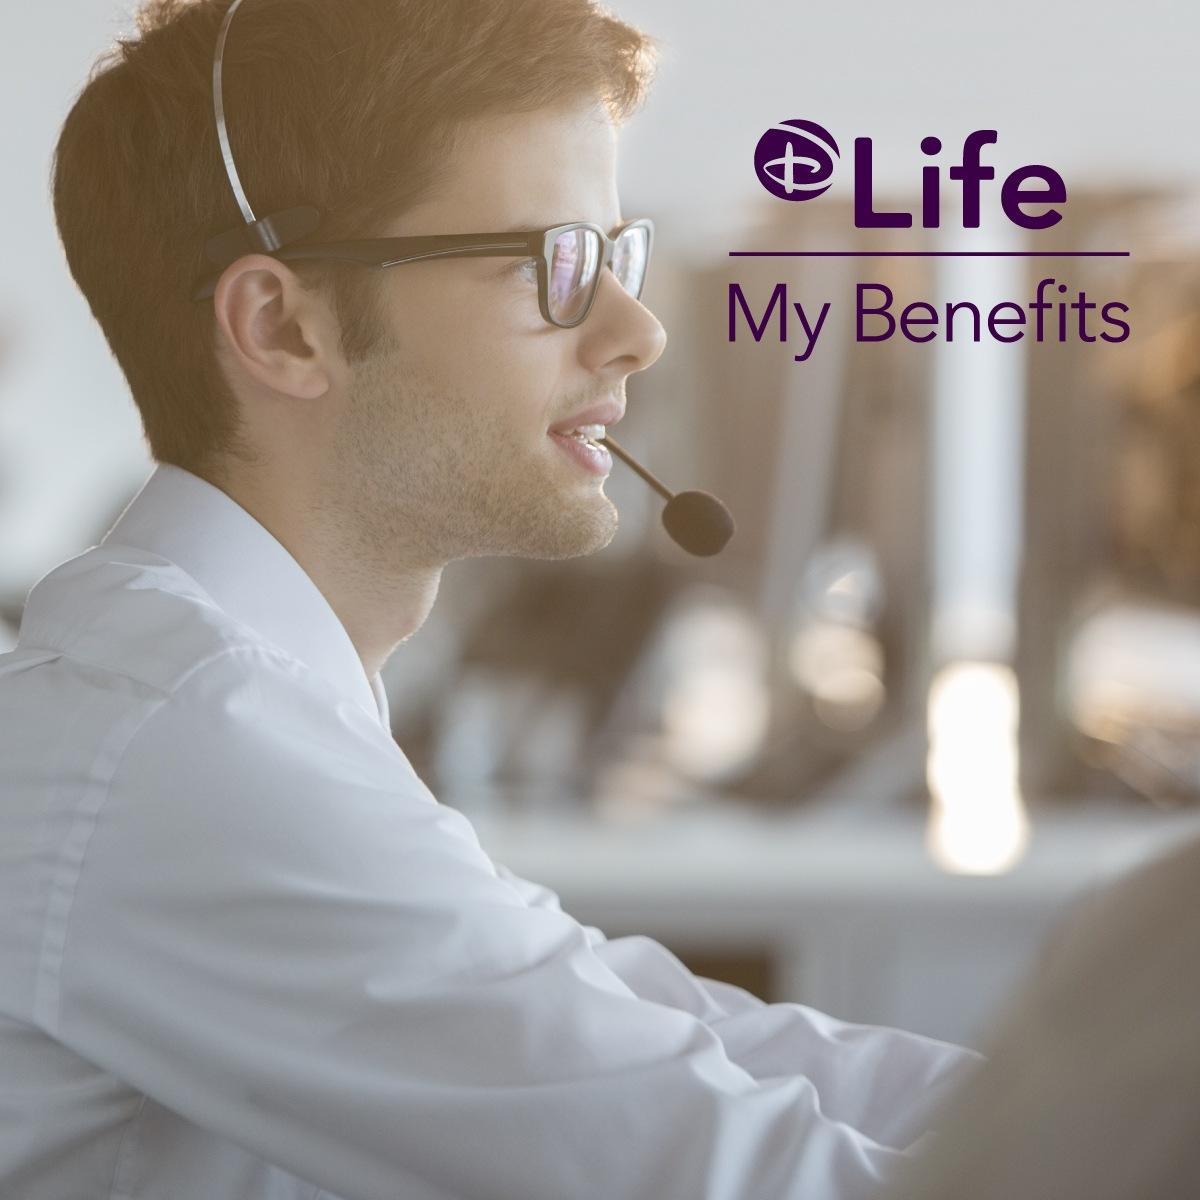 D-Life - My Benefits link